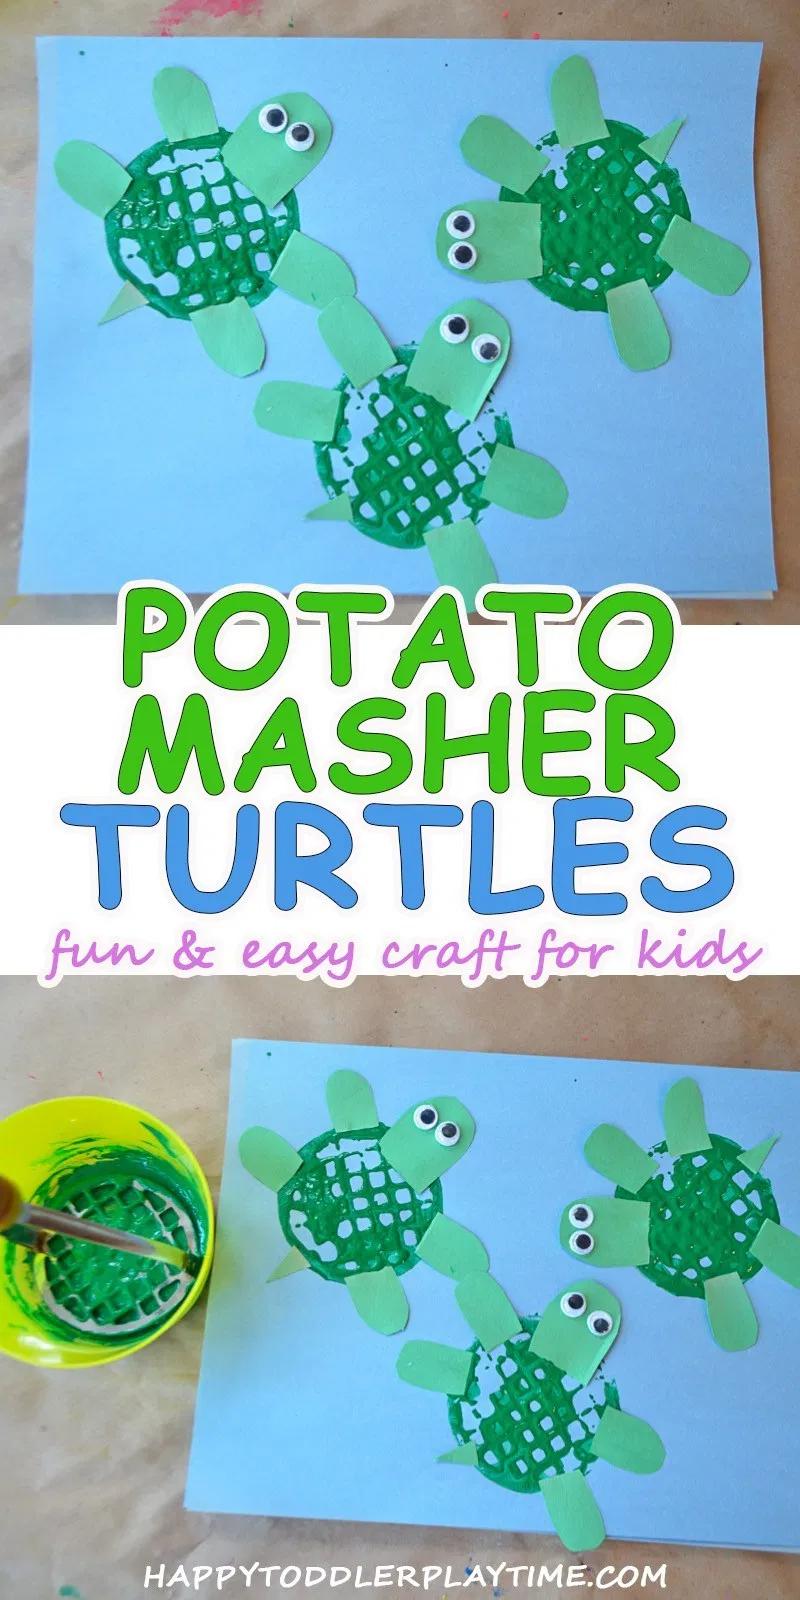 Potato Masher Turtle Craft - HAPPY TODDLER PLAYTIME